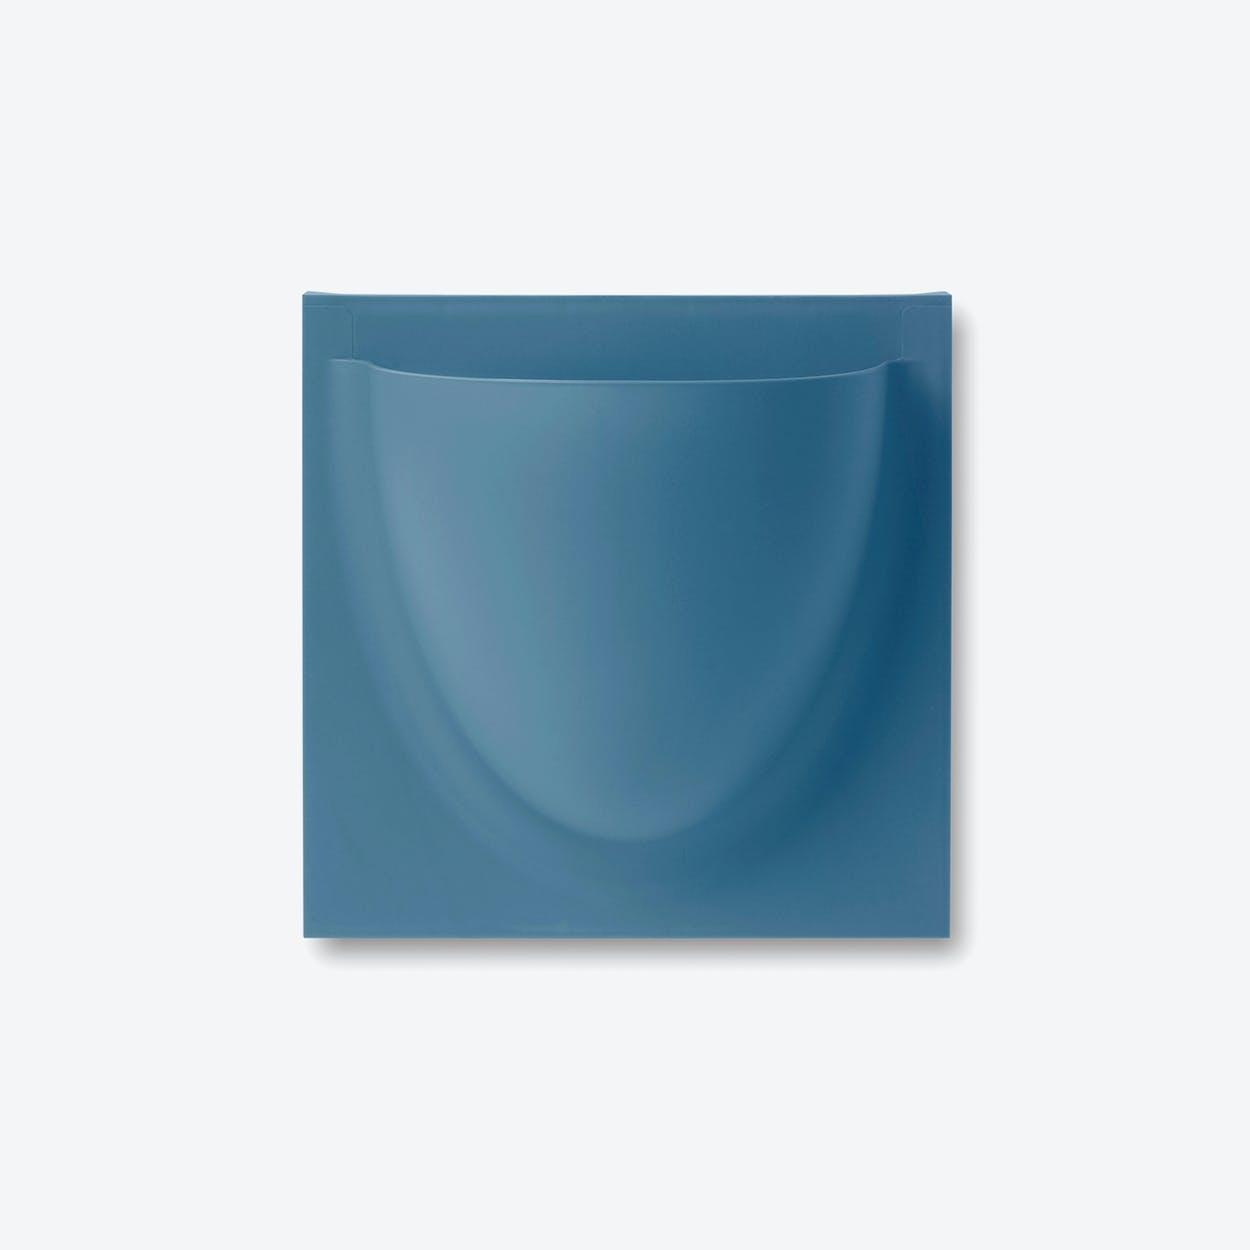 Wall Planter / Jar Mini in Pastel Blue (Set of 2)